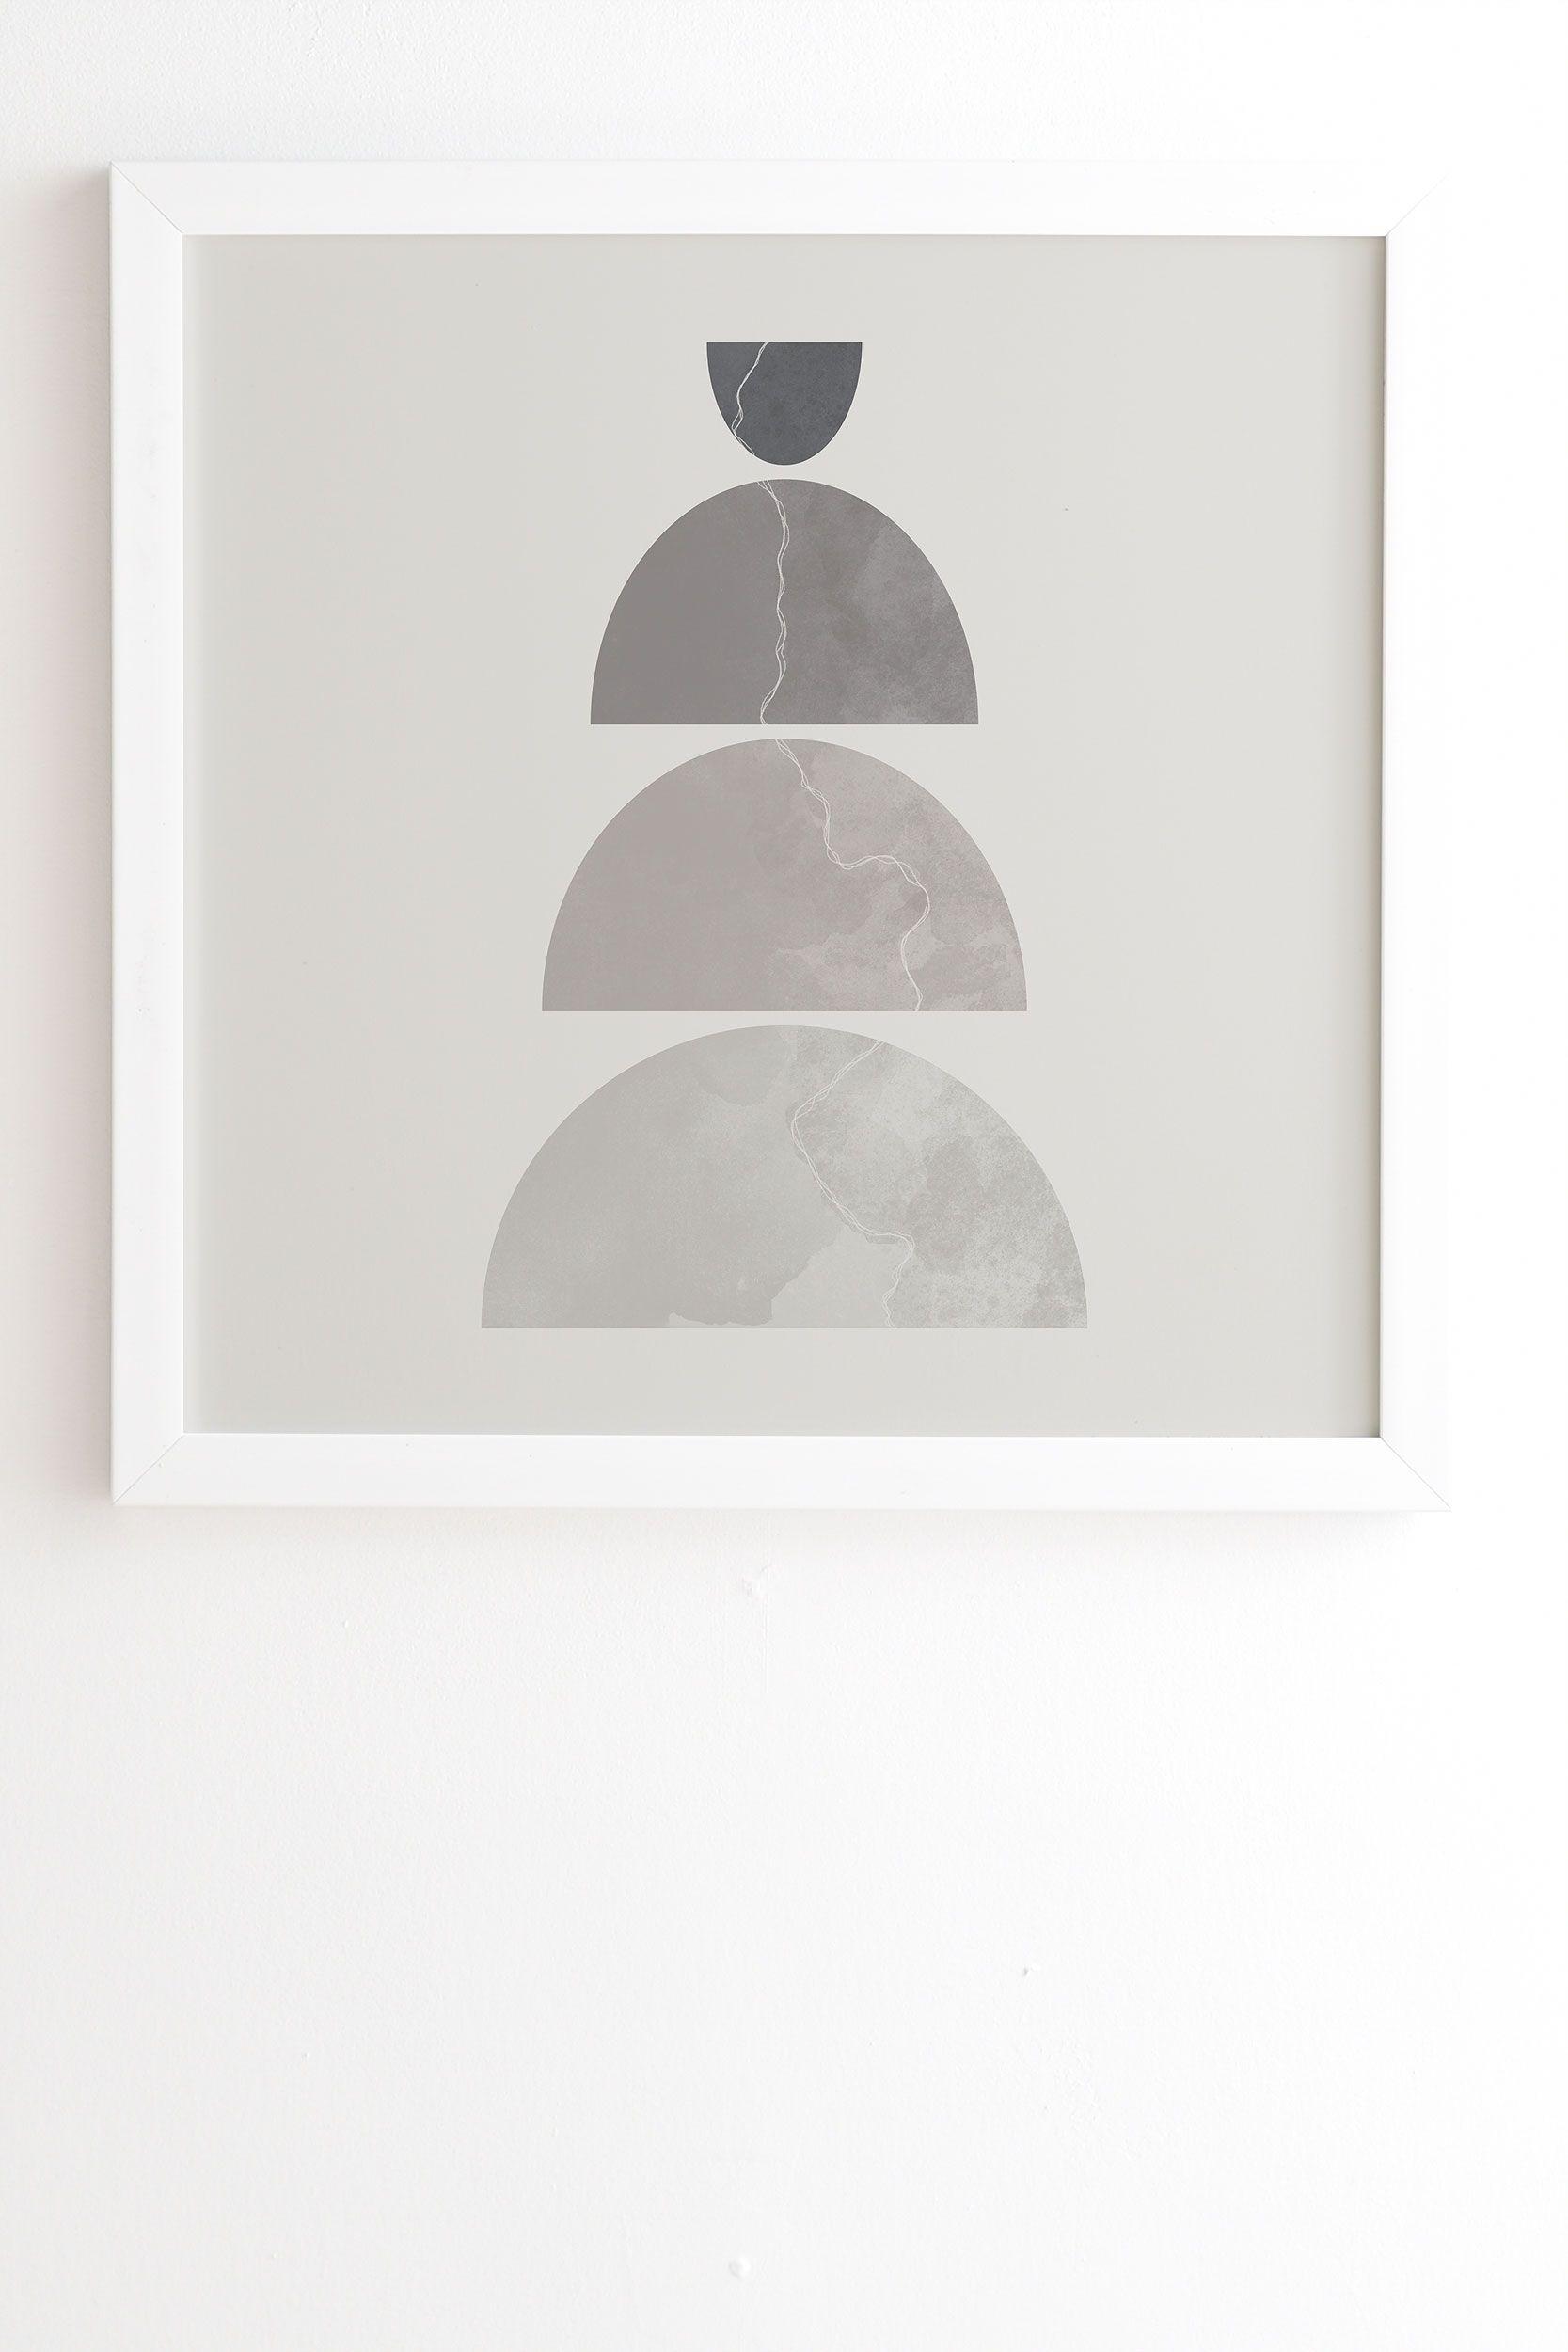 "Monochrome Balance 1 by Alisa Galitsyna, Framed Wall Art Print, White, 30"" x 30"""